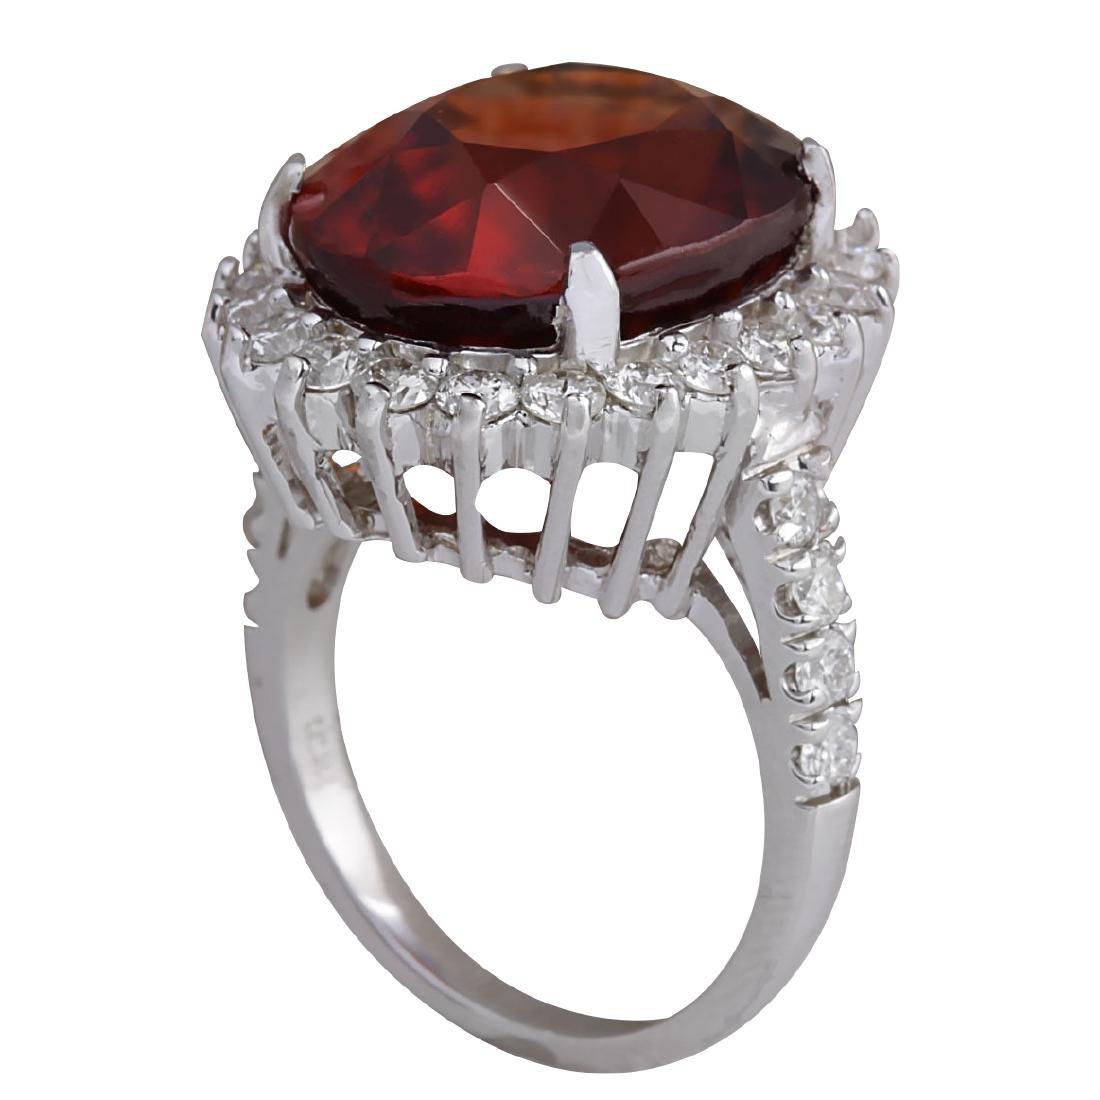 18.43Ct Natural Red Hessonite Garnet And Diamond Ring - 3